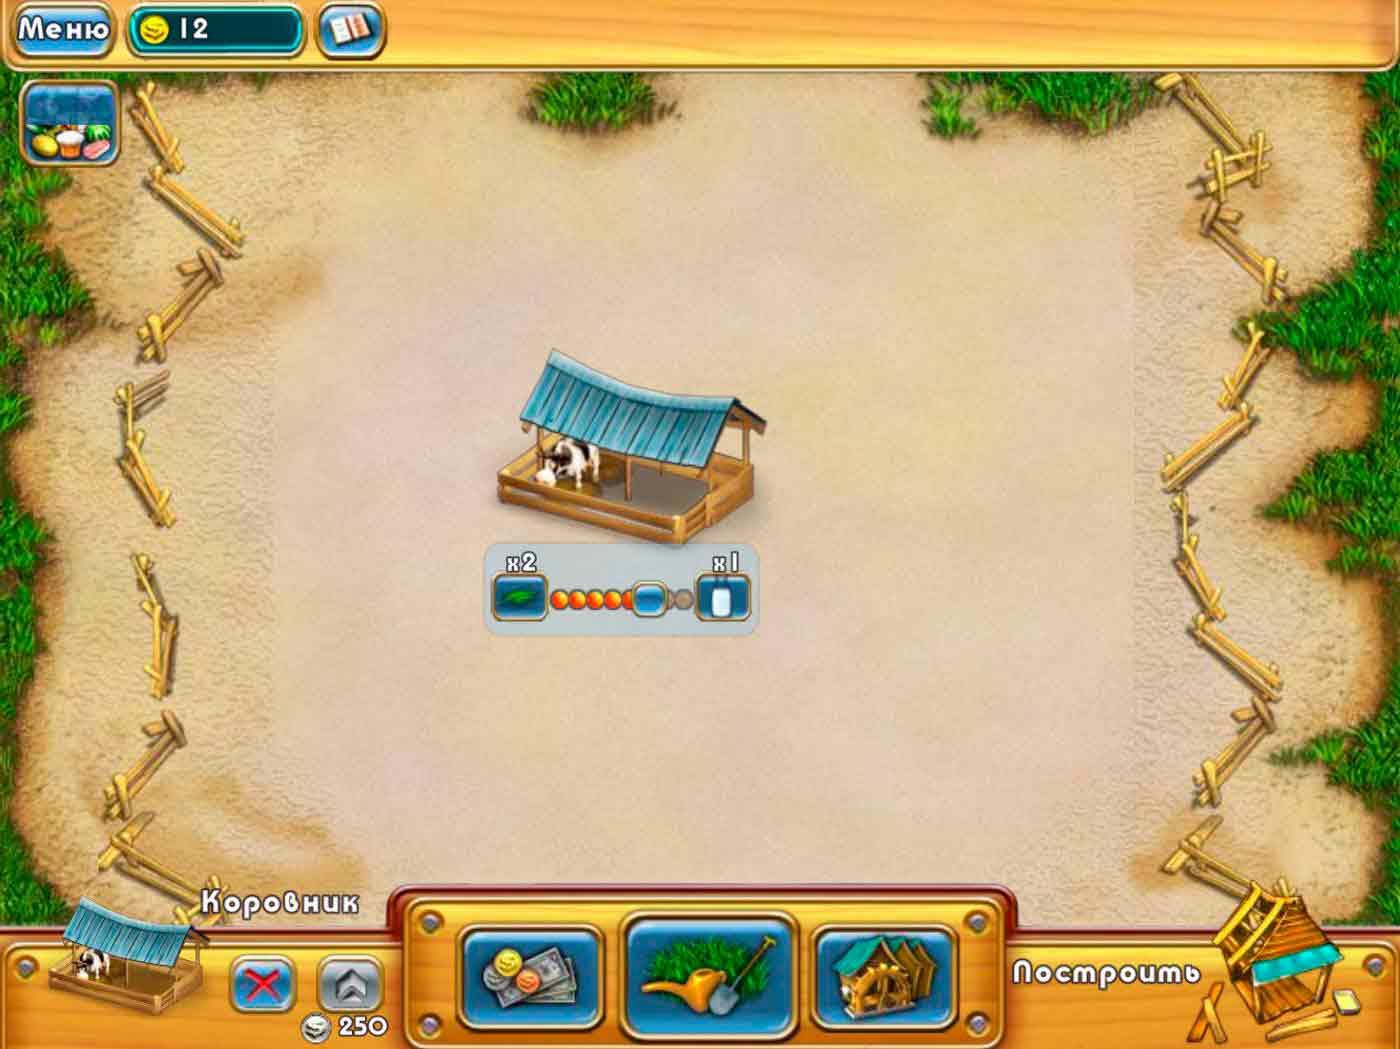 Скачать мини игру Чудо ферма / Virtual Farm. Скачено 25.